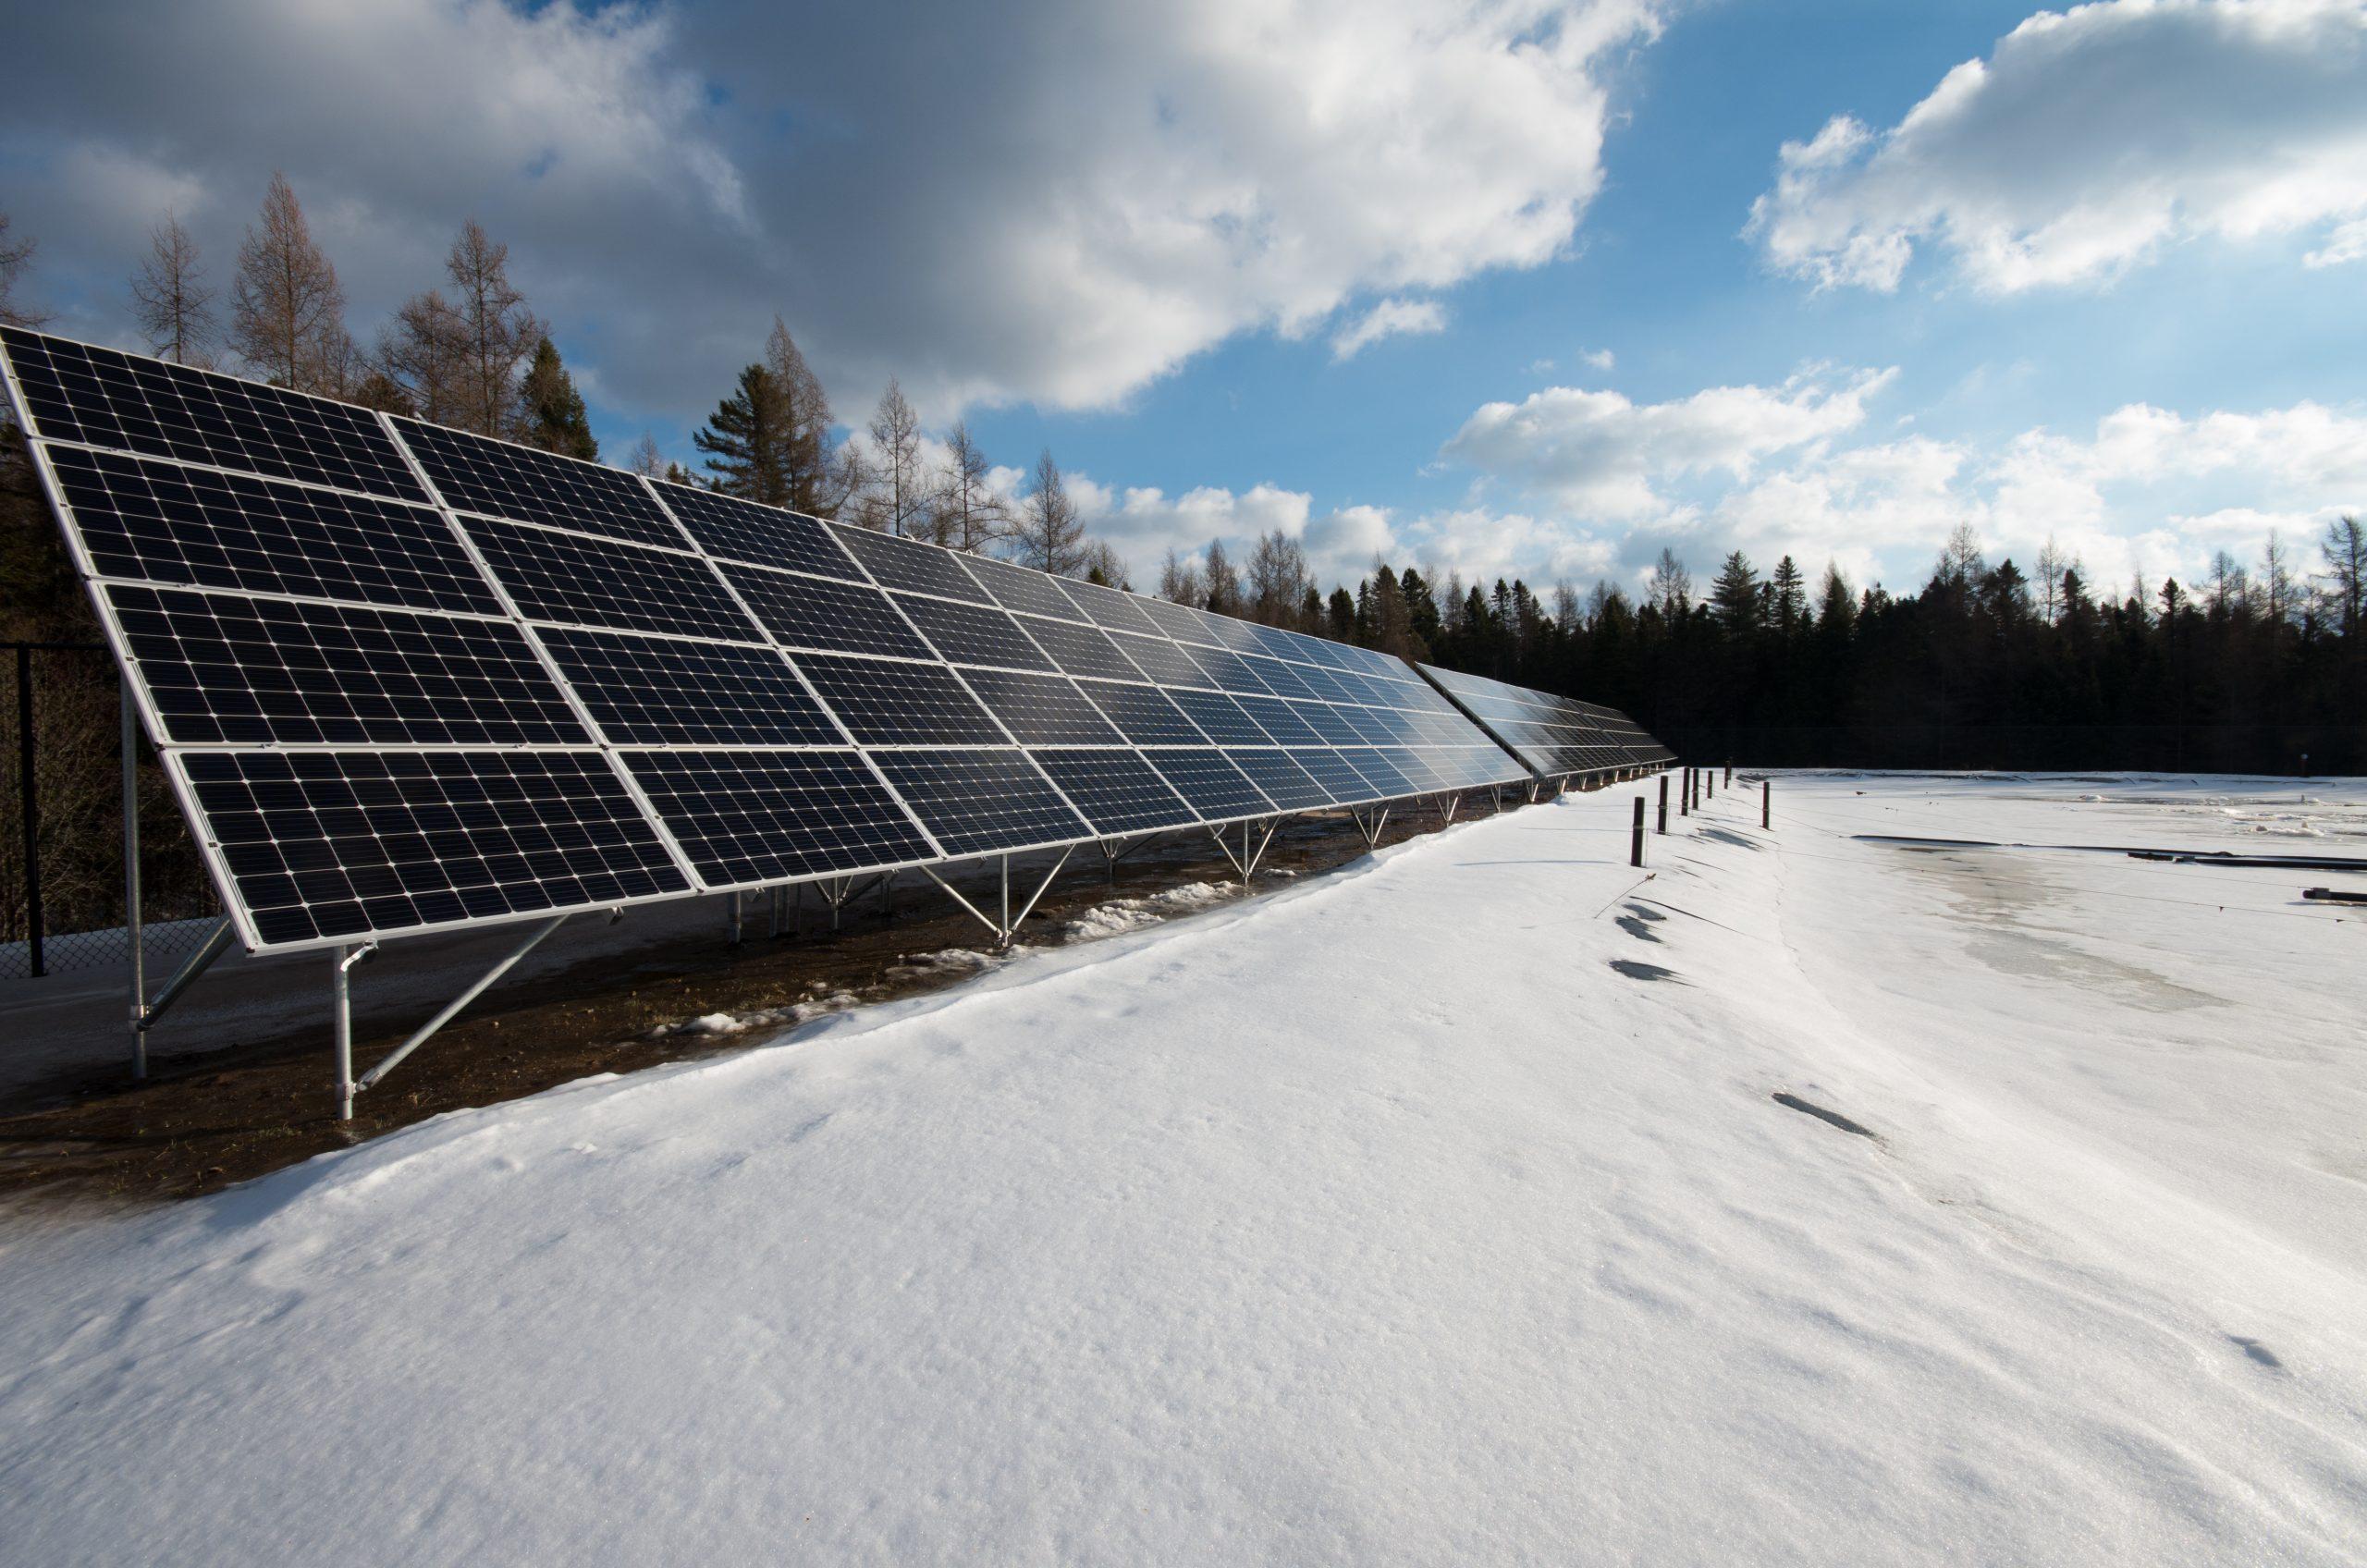 Photo of solar panel array.